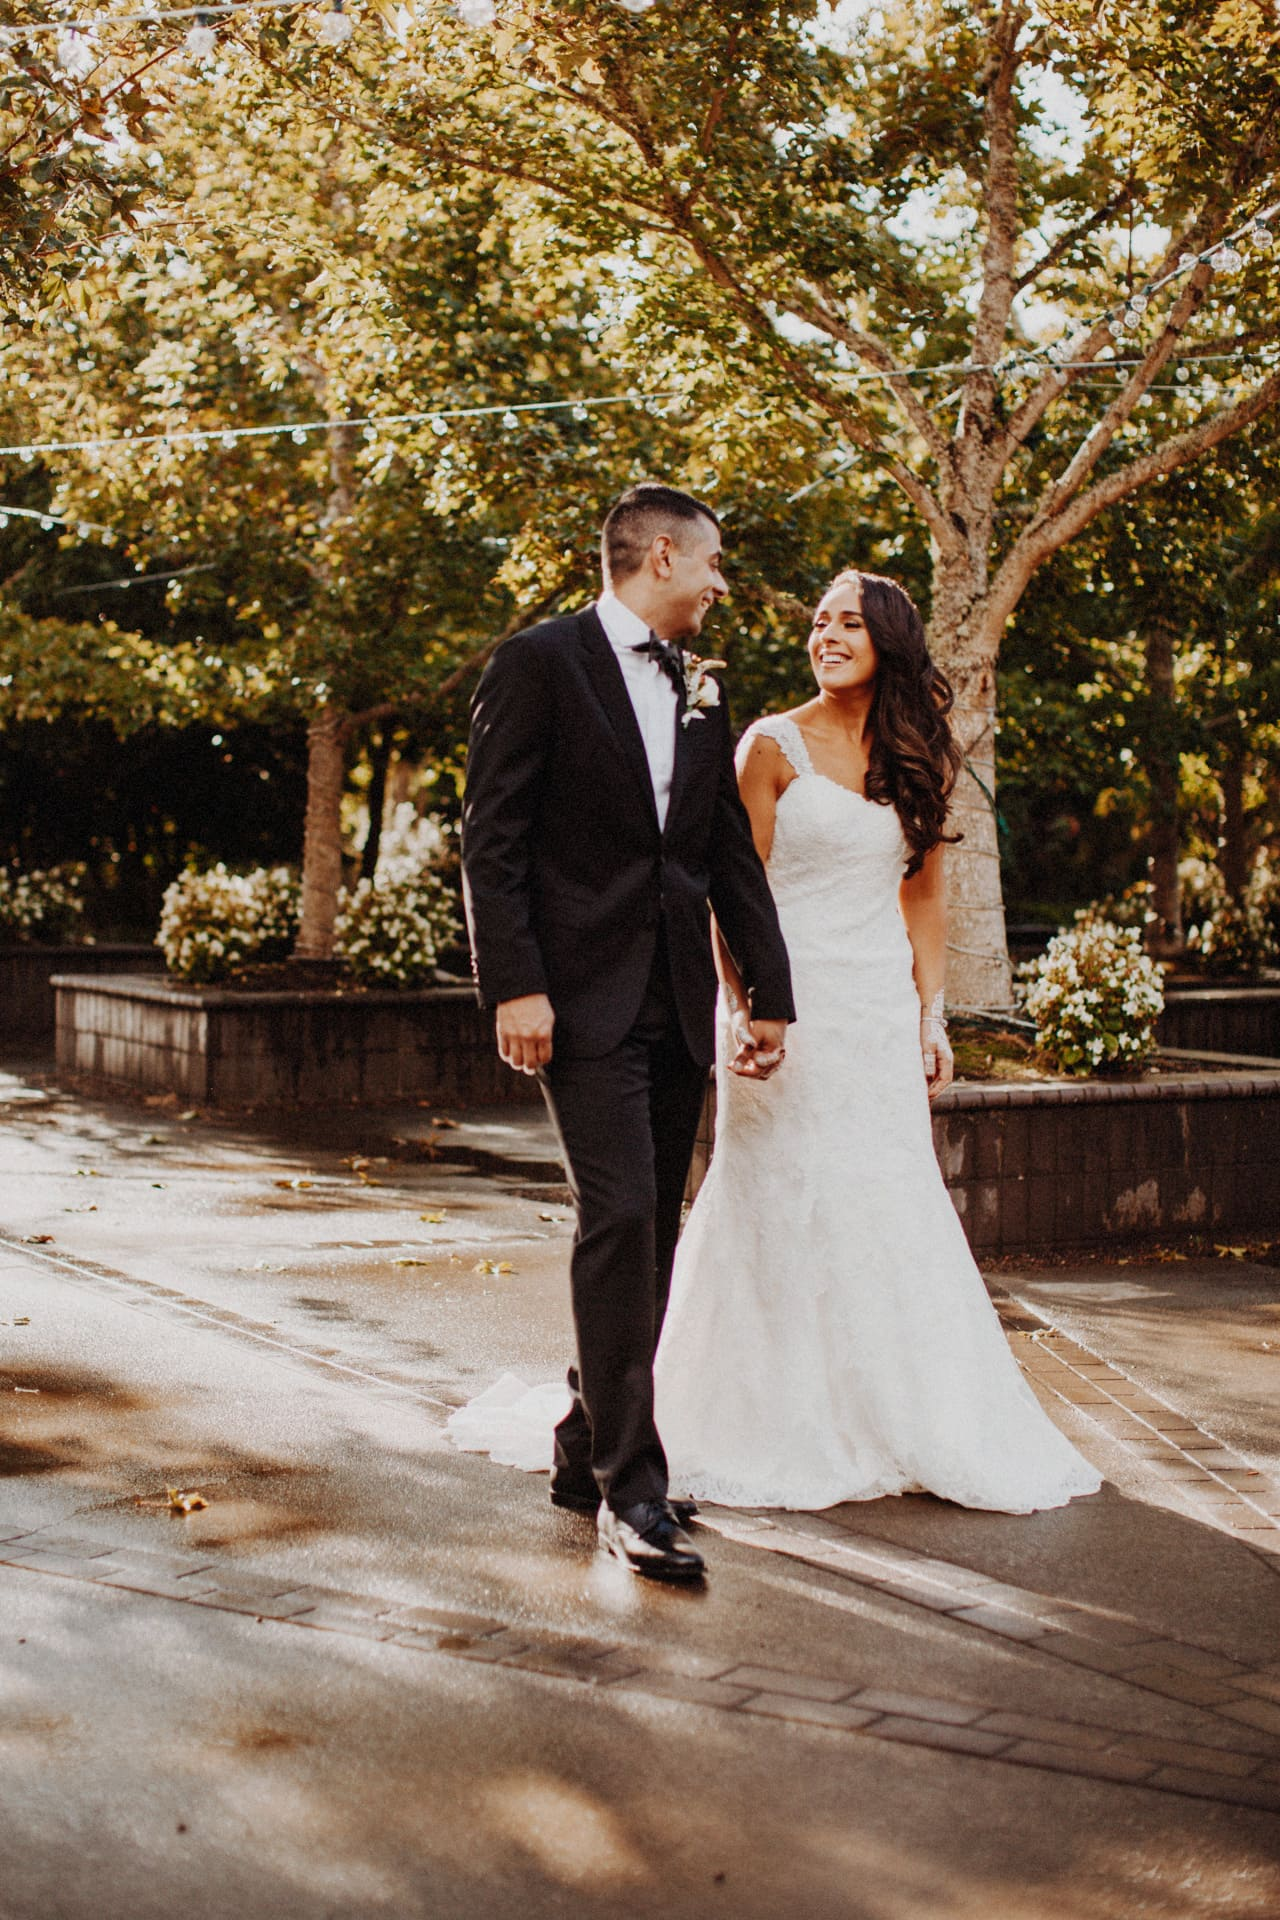 the bride and groom walking through the oregon garden resort at their wedding